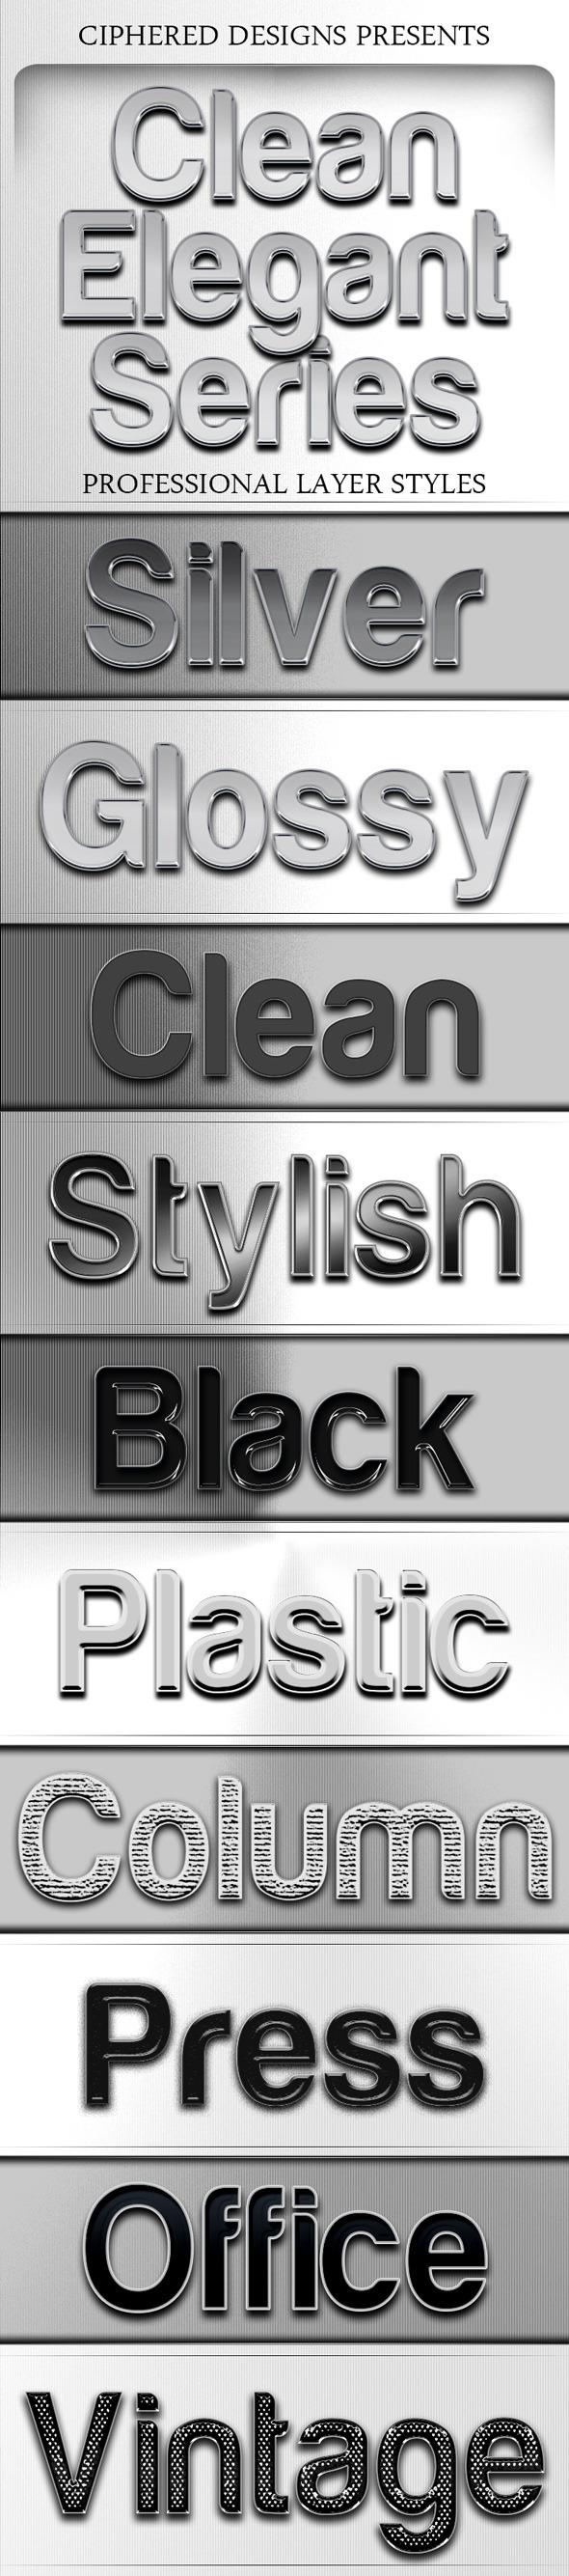 Clean Elegant Series - Professional Layer Styles